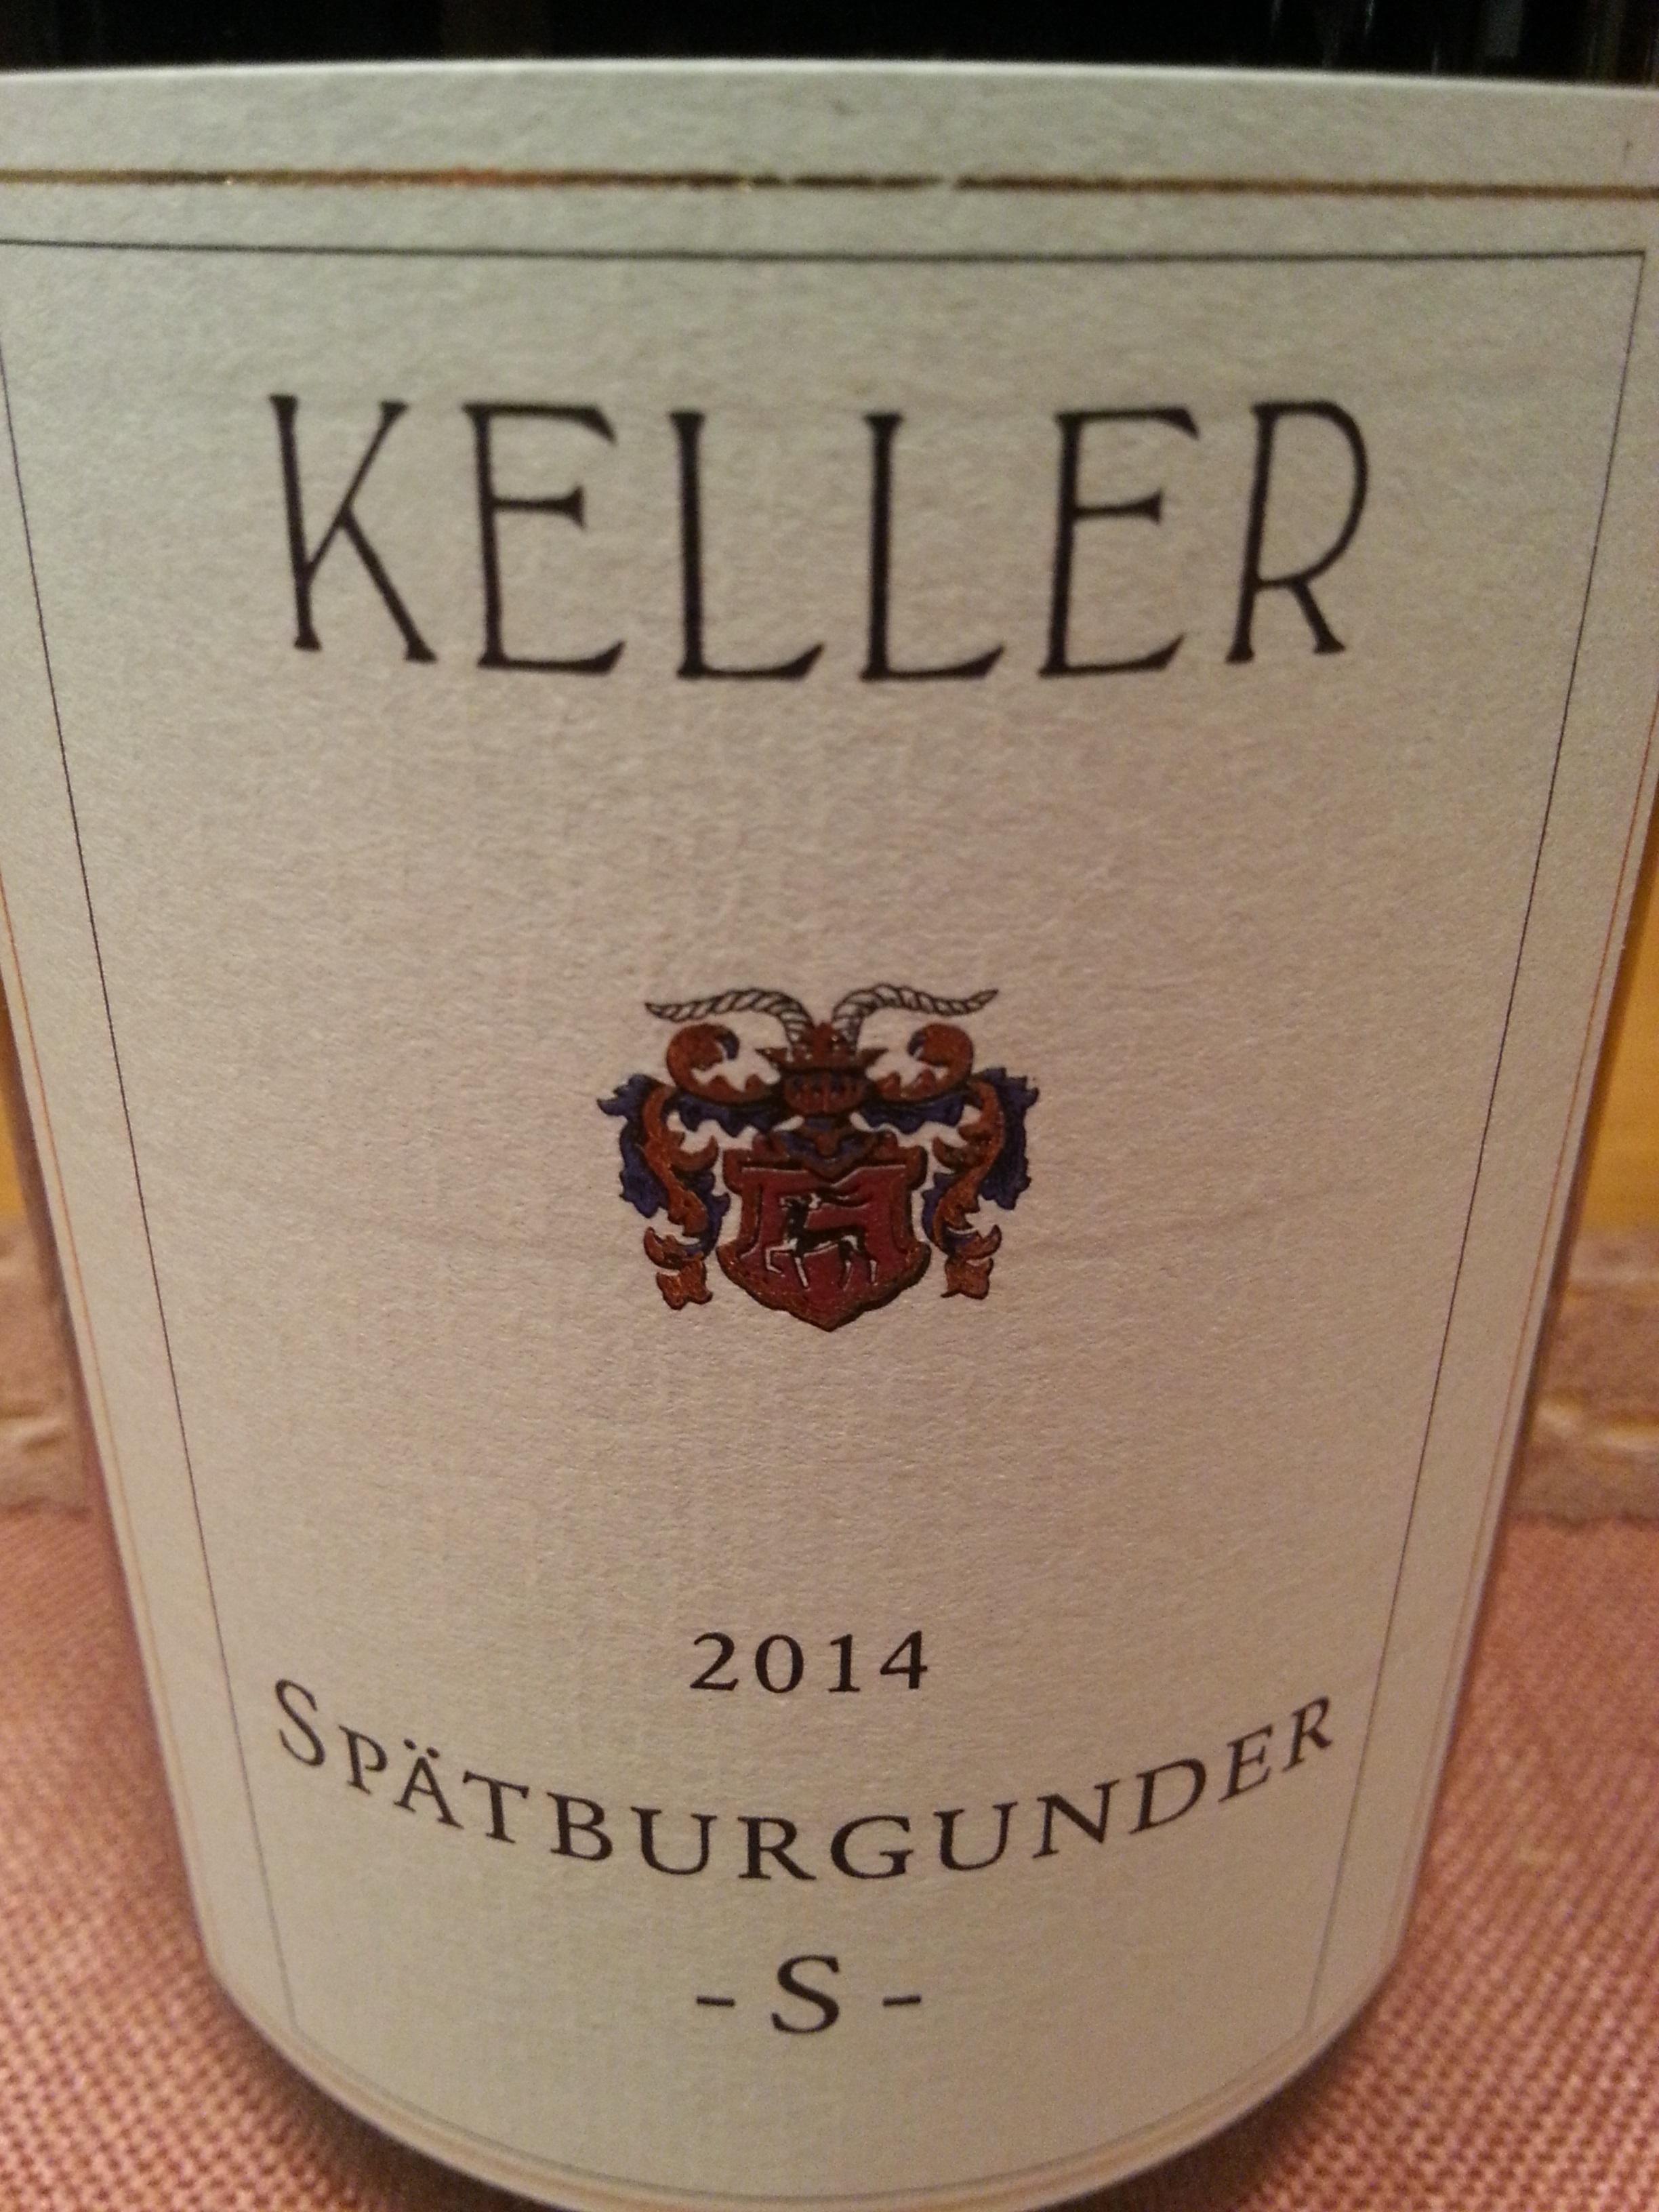 2014 Spätburgunder S | Keller